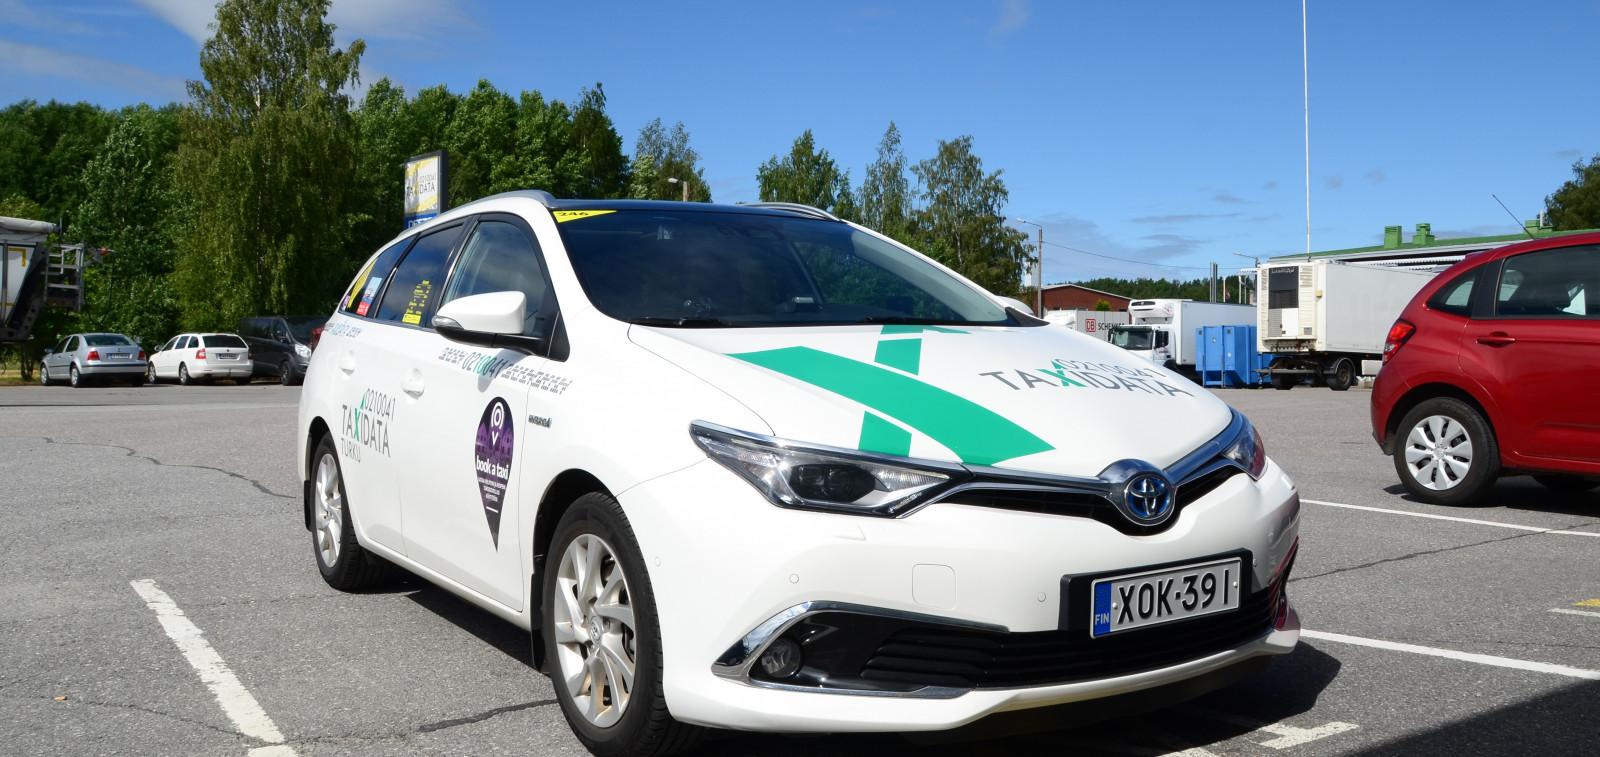 Lounais-Suomen Taxidata auto